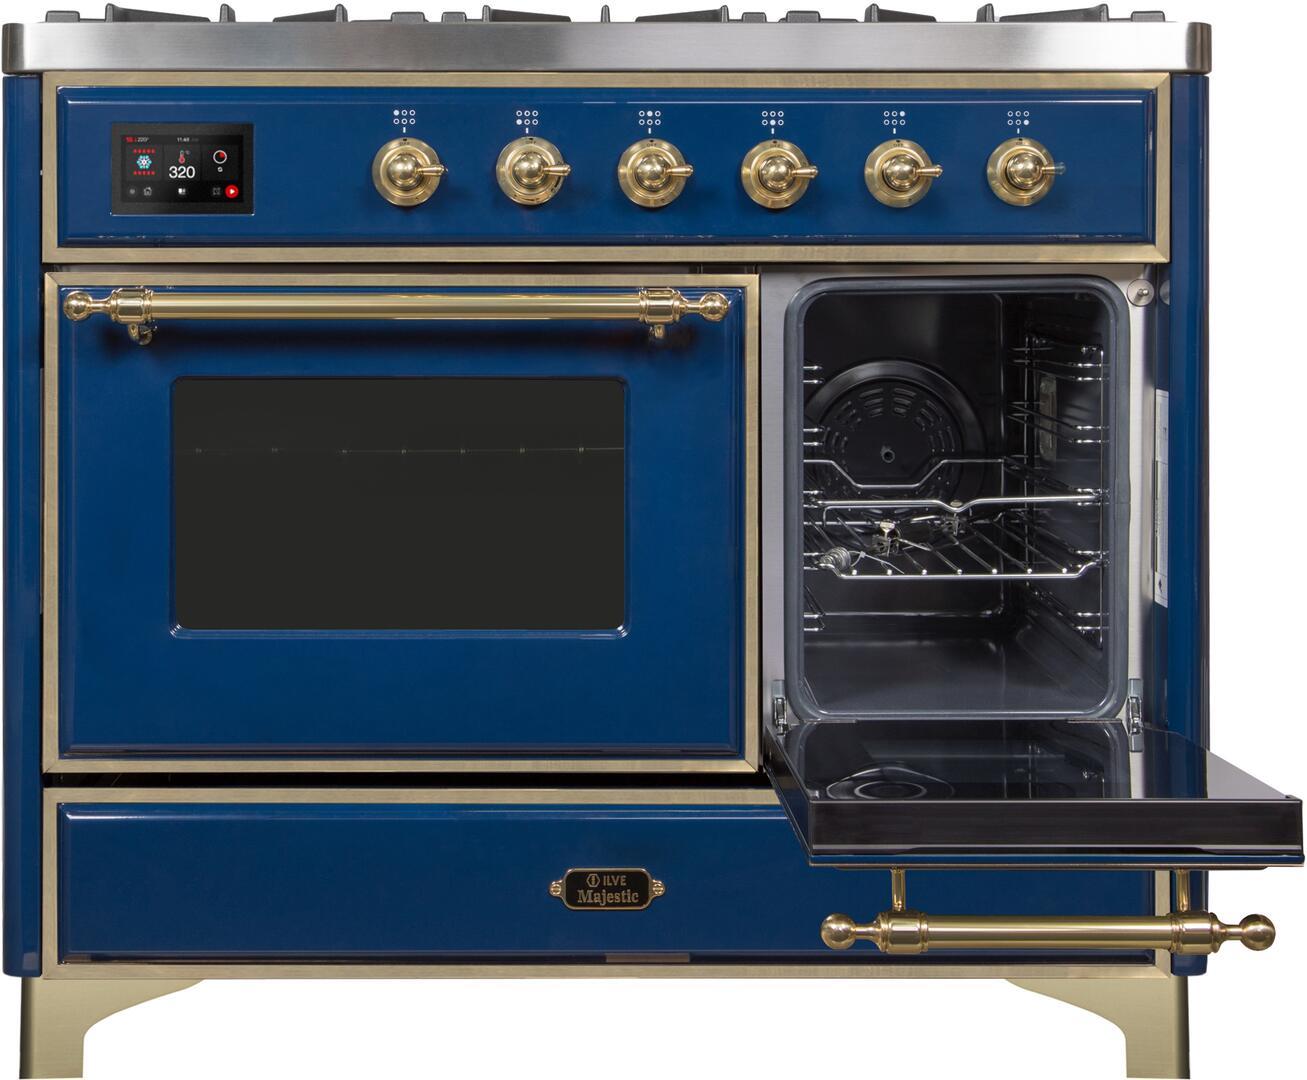 Ilve Majestic II UMD10FDNS3MBG Freestanding Dual Fuel Range Blue, UMD10FDNS3MBG Secondary Door Opened